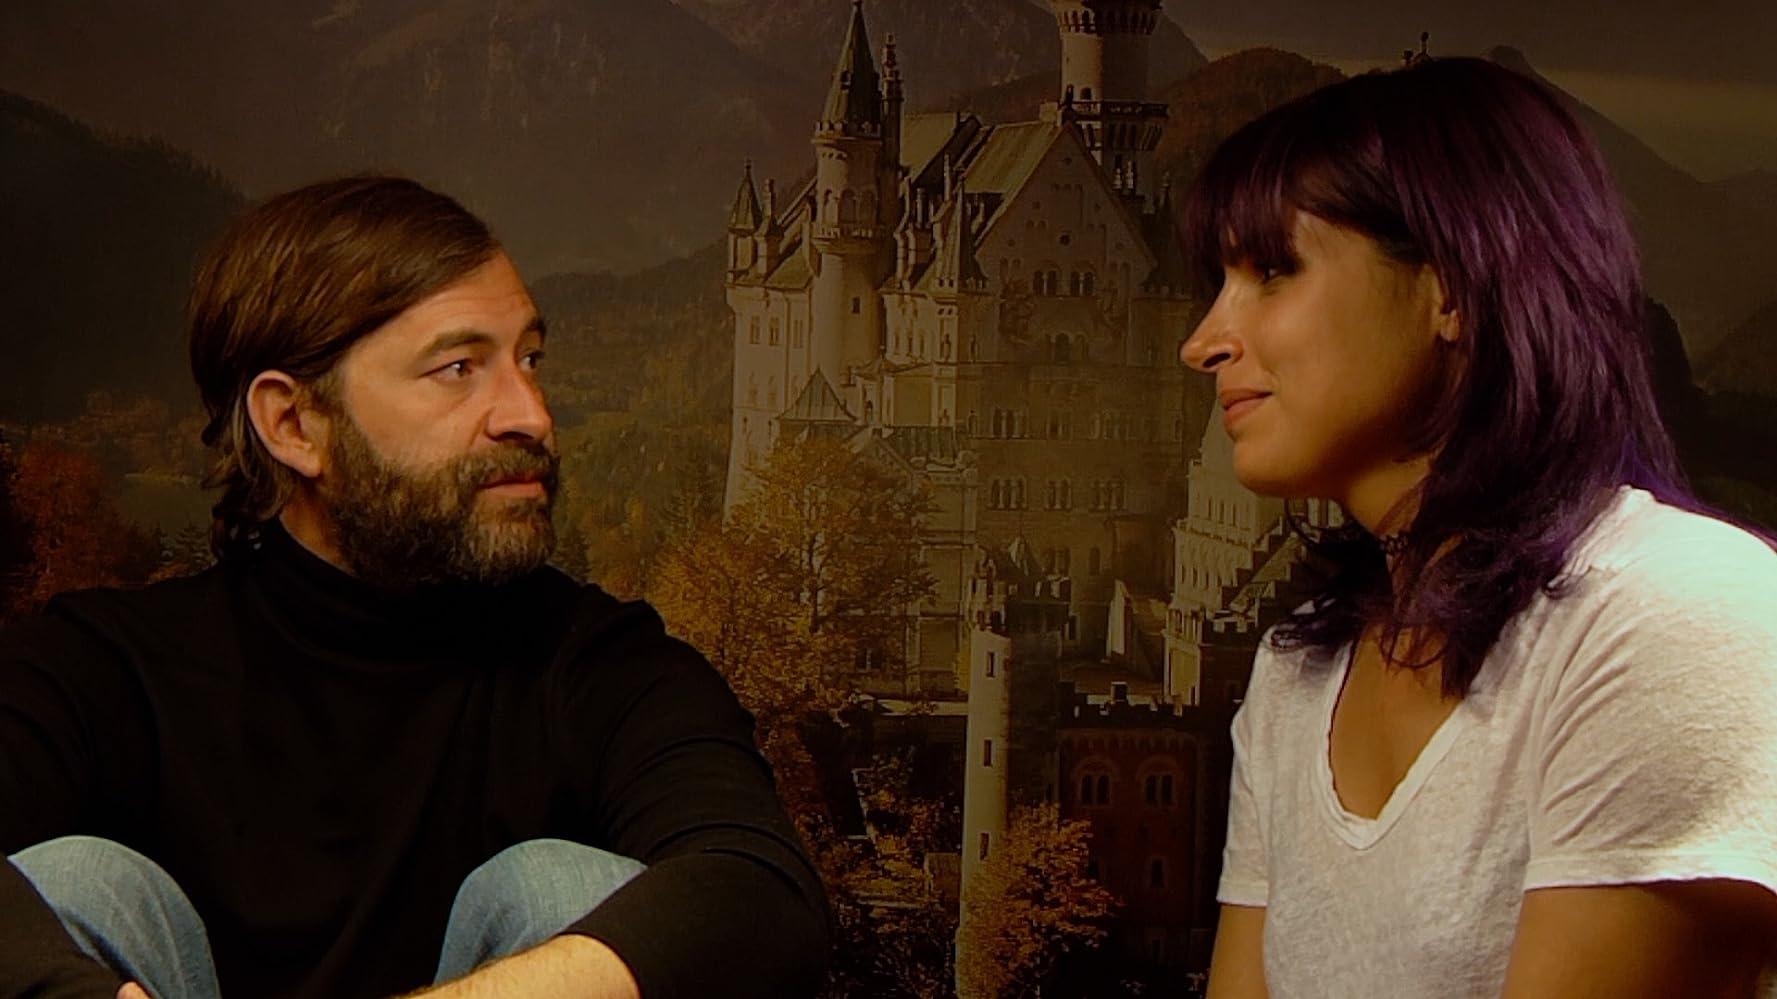 Mark Duplass and Desiree Akhavan in Creep 2 (2017)